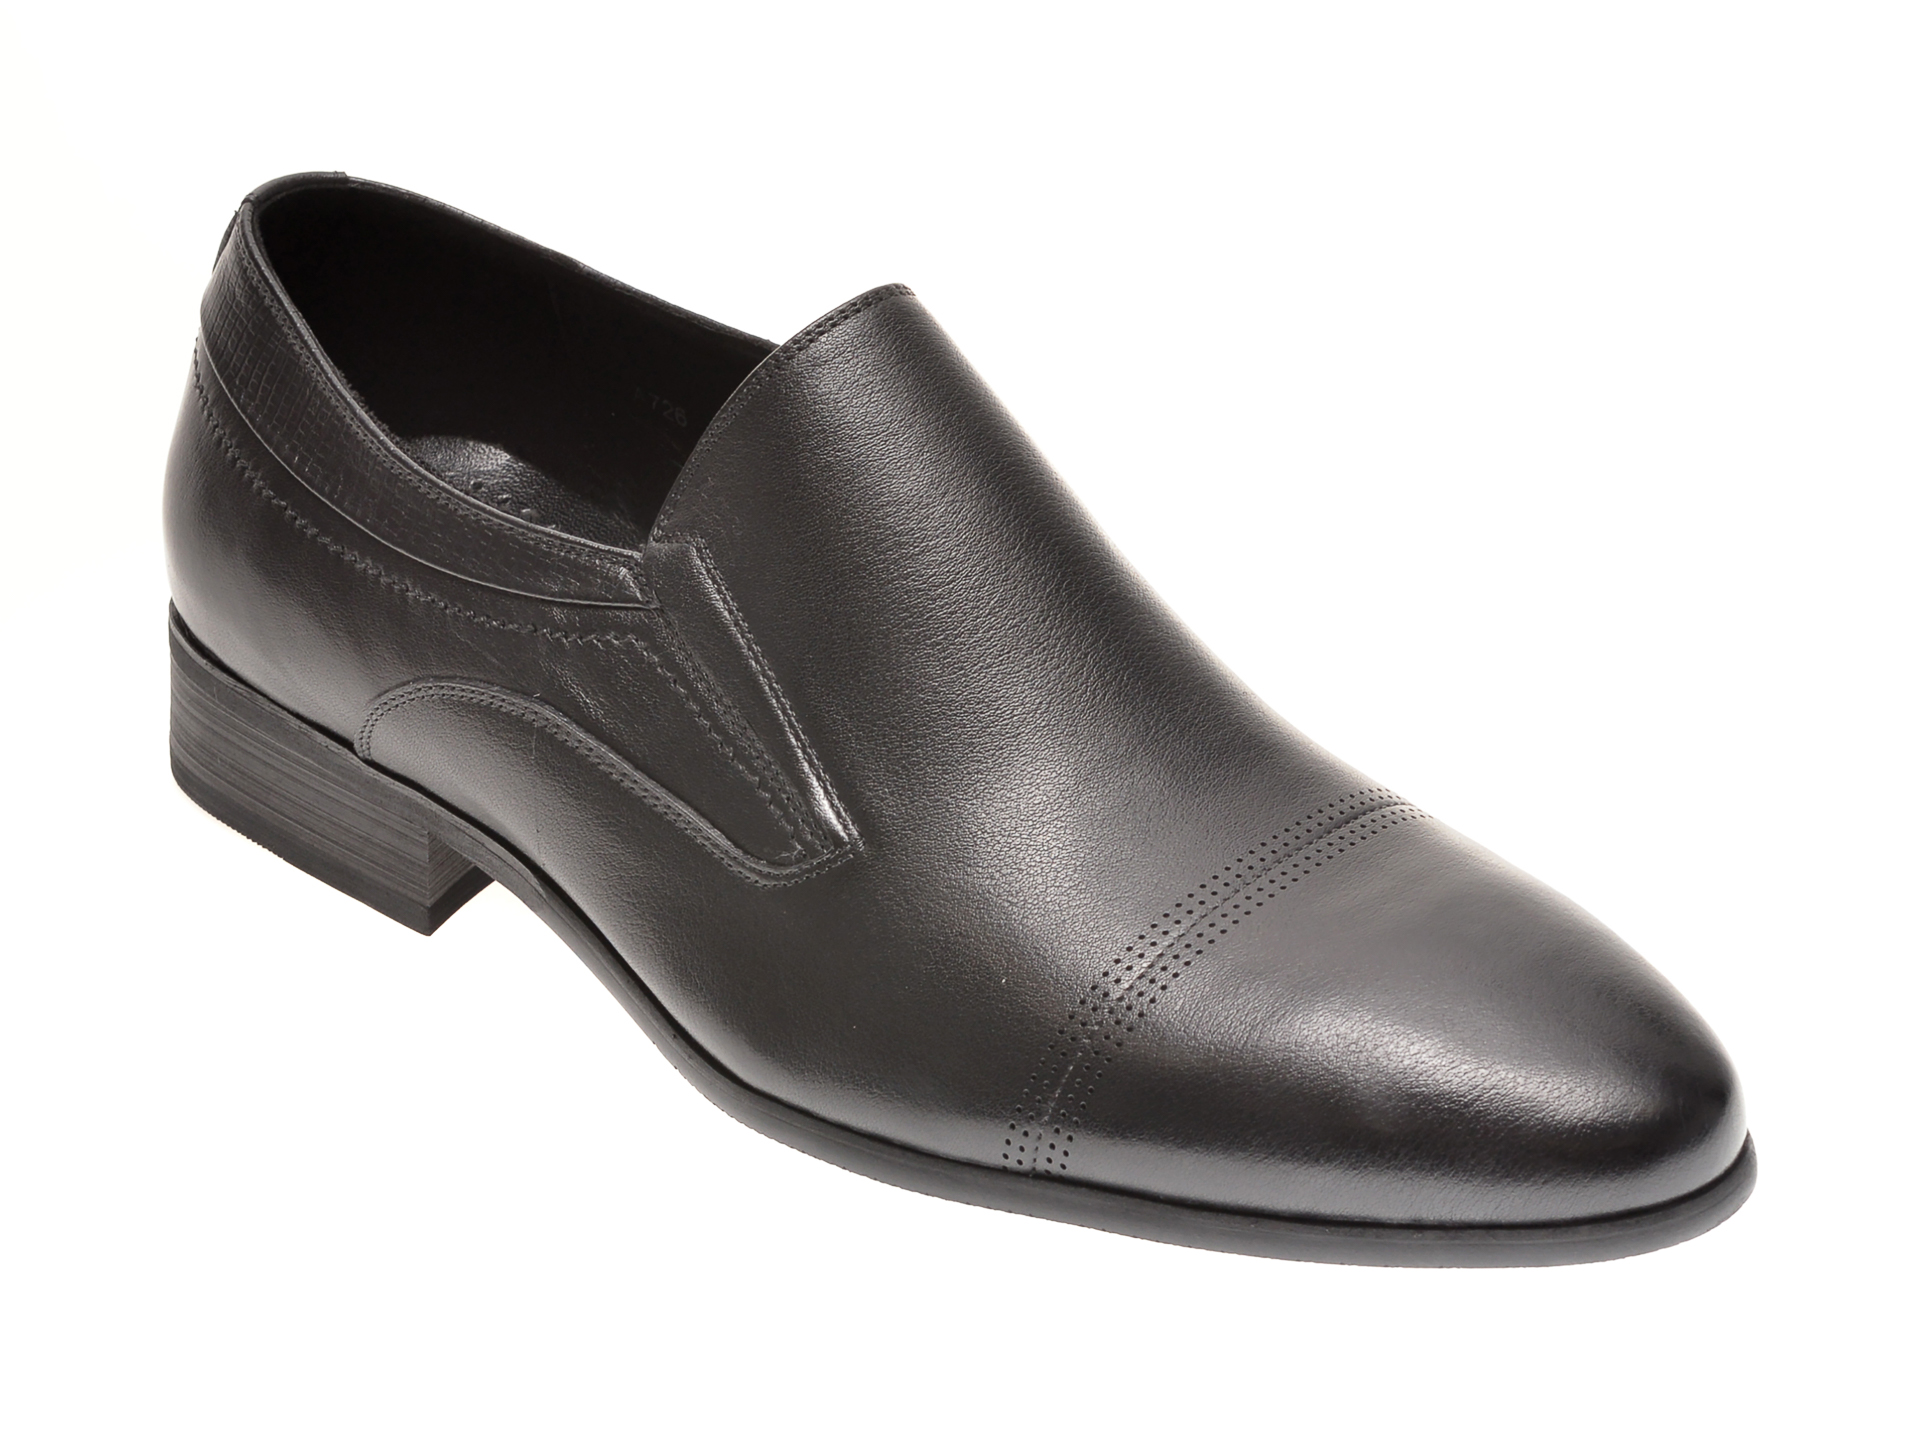 Pantofi Otter Negri, A726, Din Piele Naturala